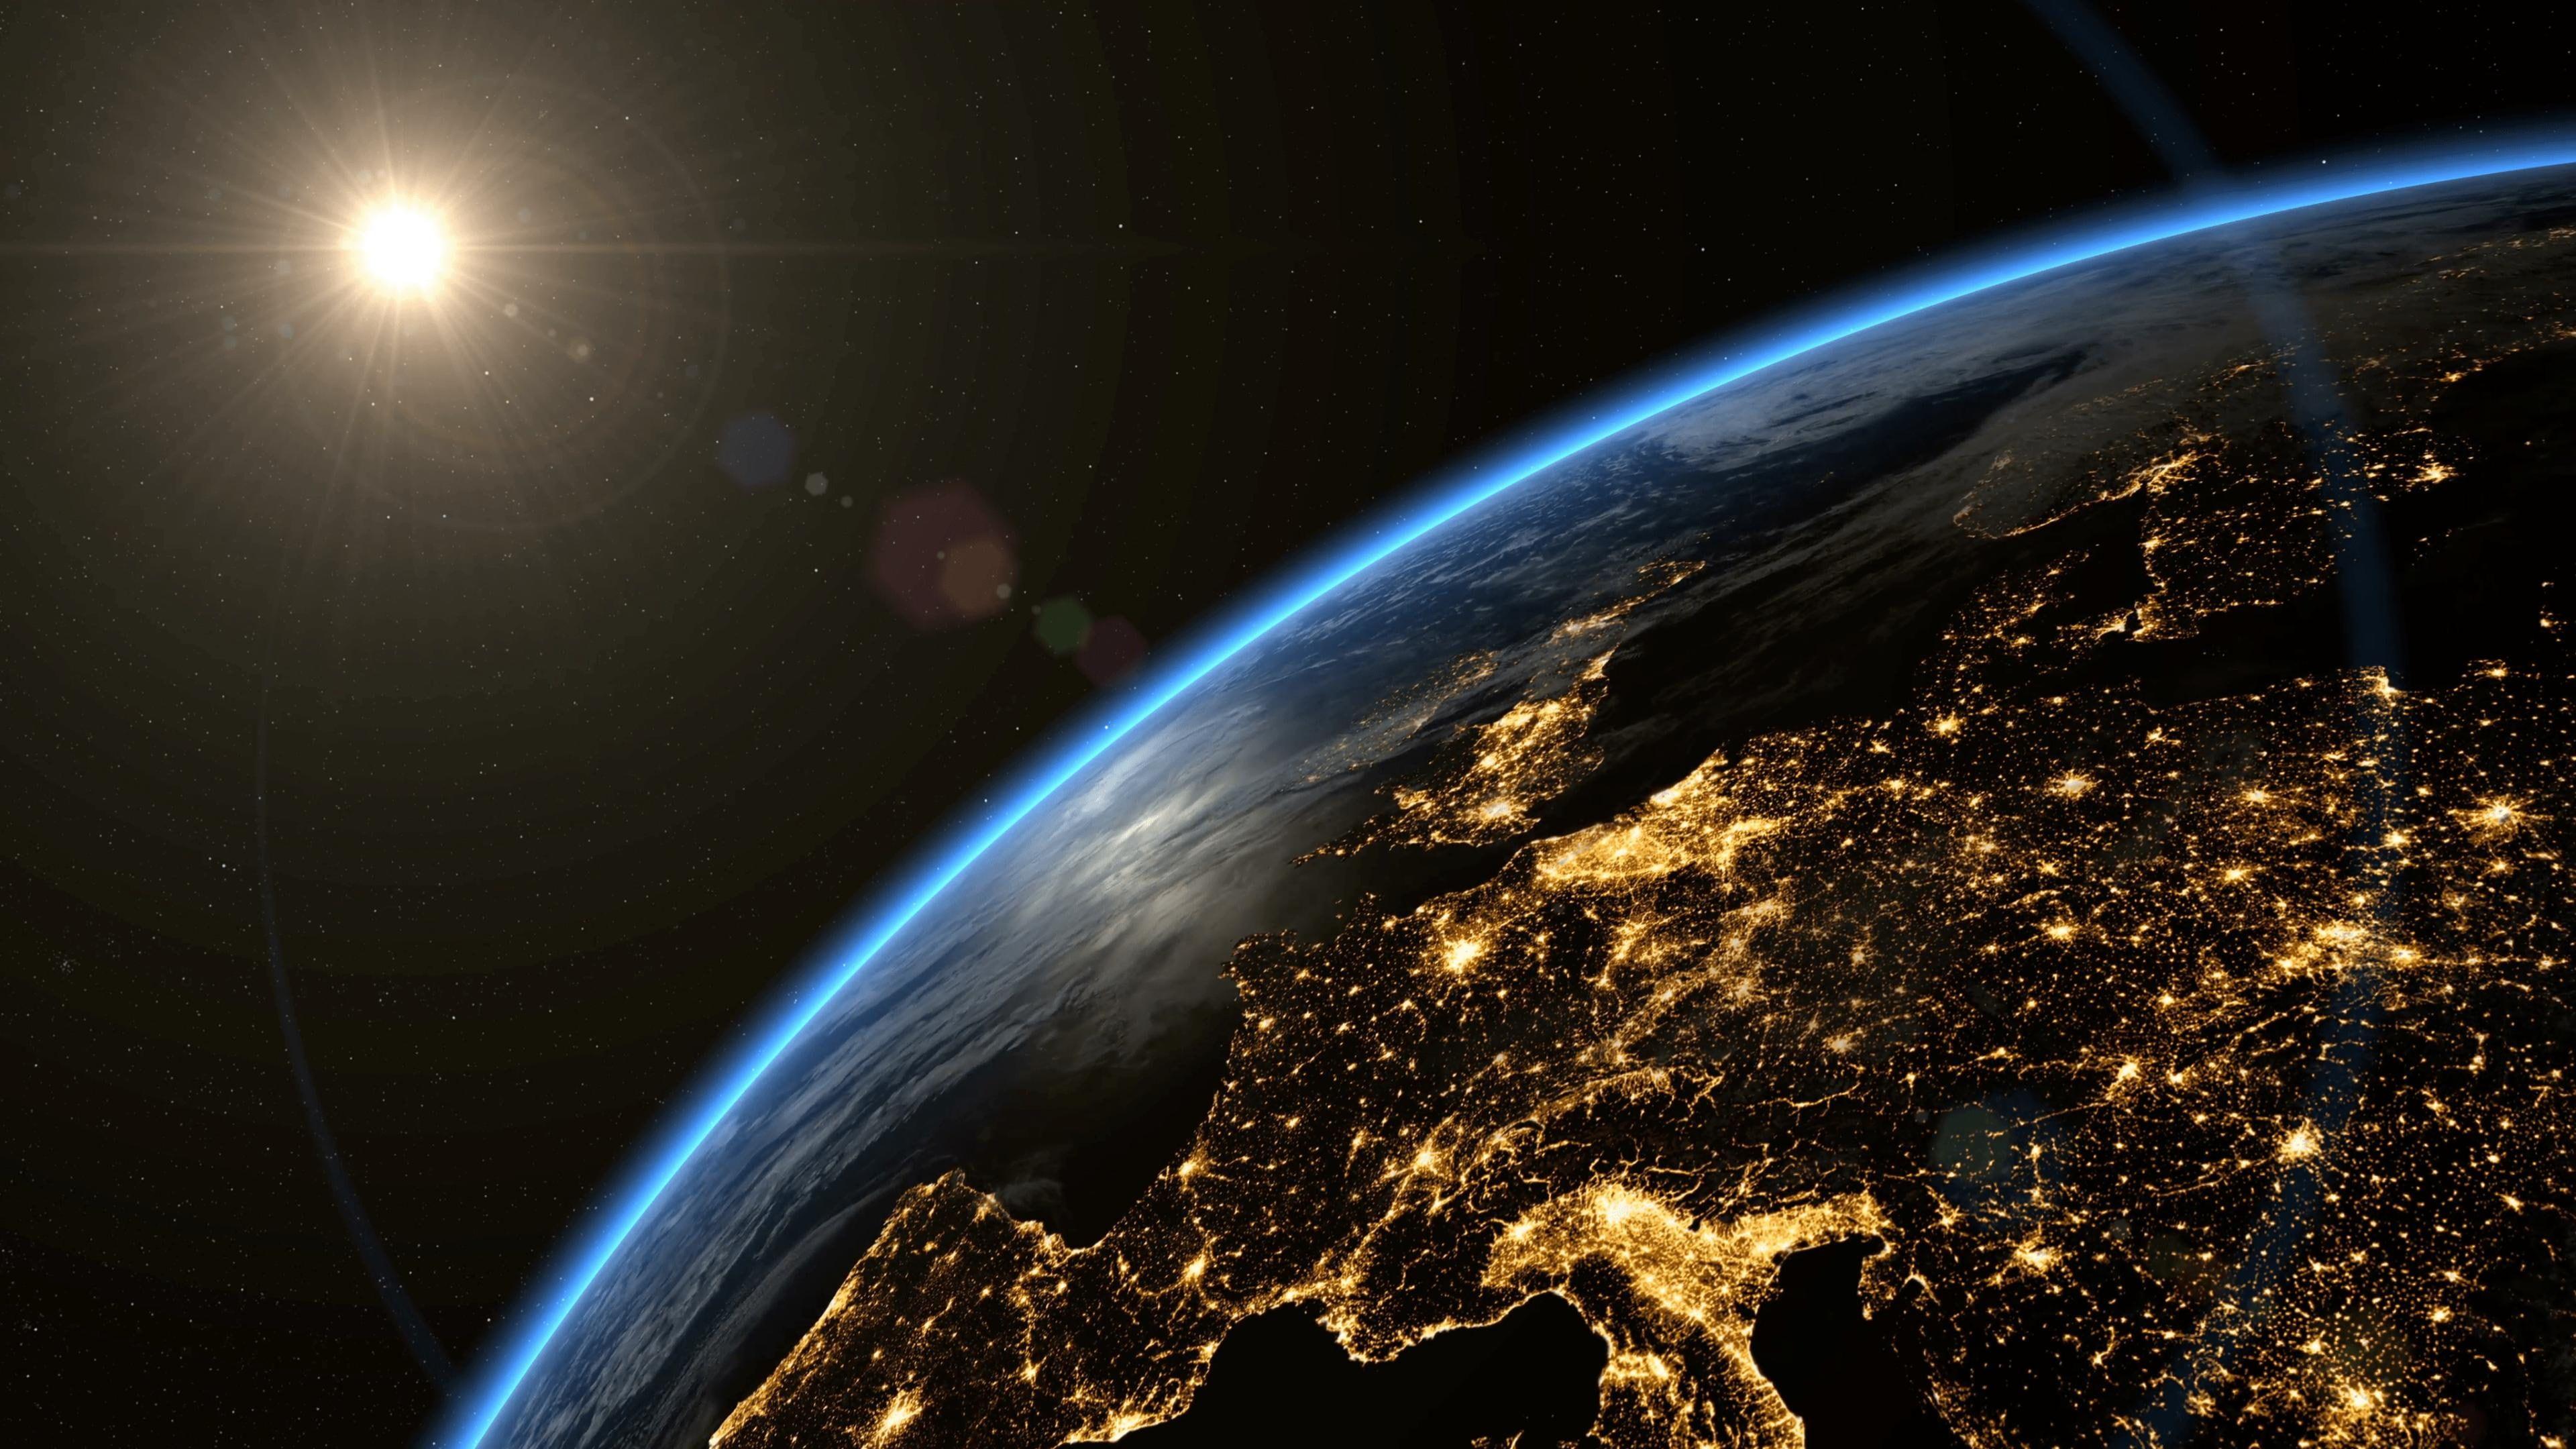 earth satellite imagery lens flare orbit space